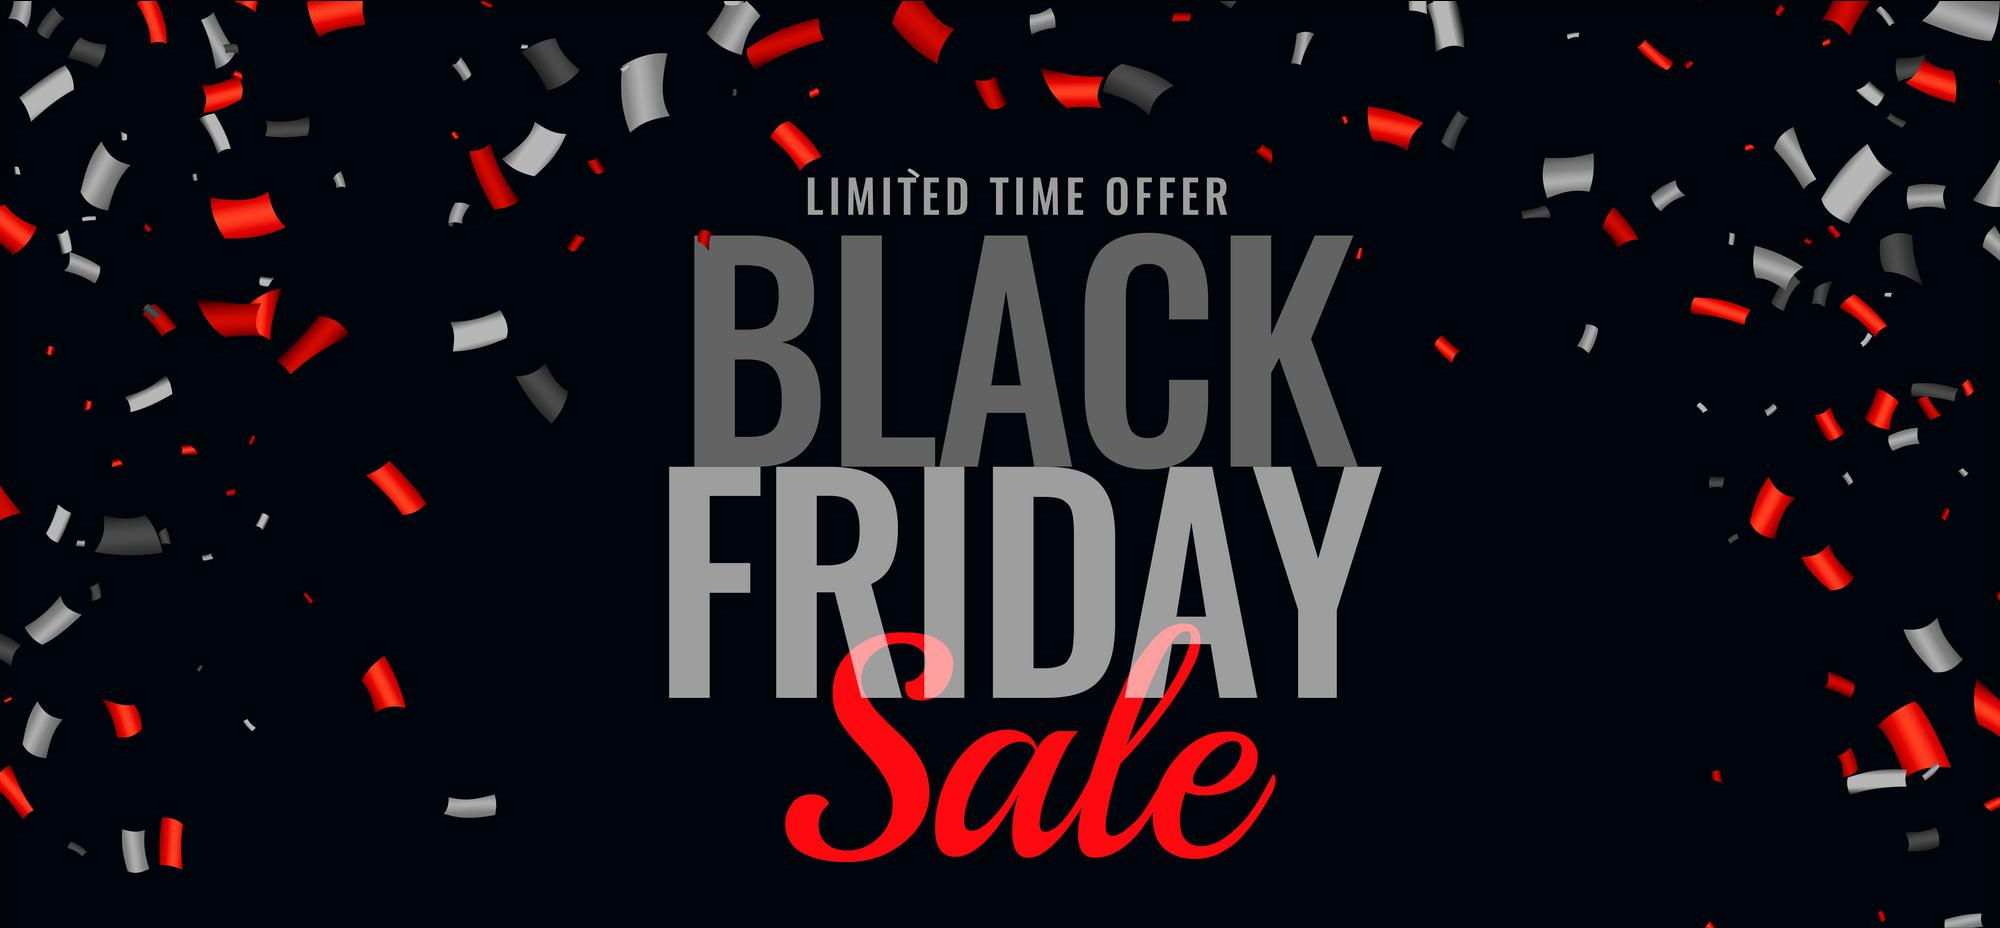 Best Black Friday SaaS deals 2018